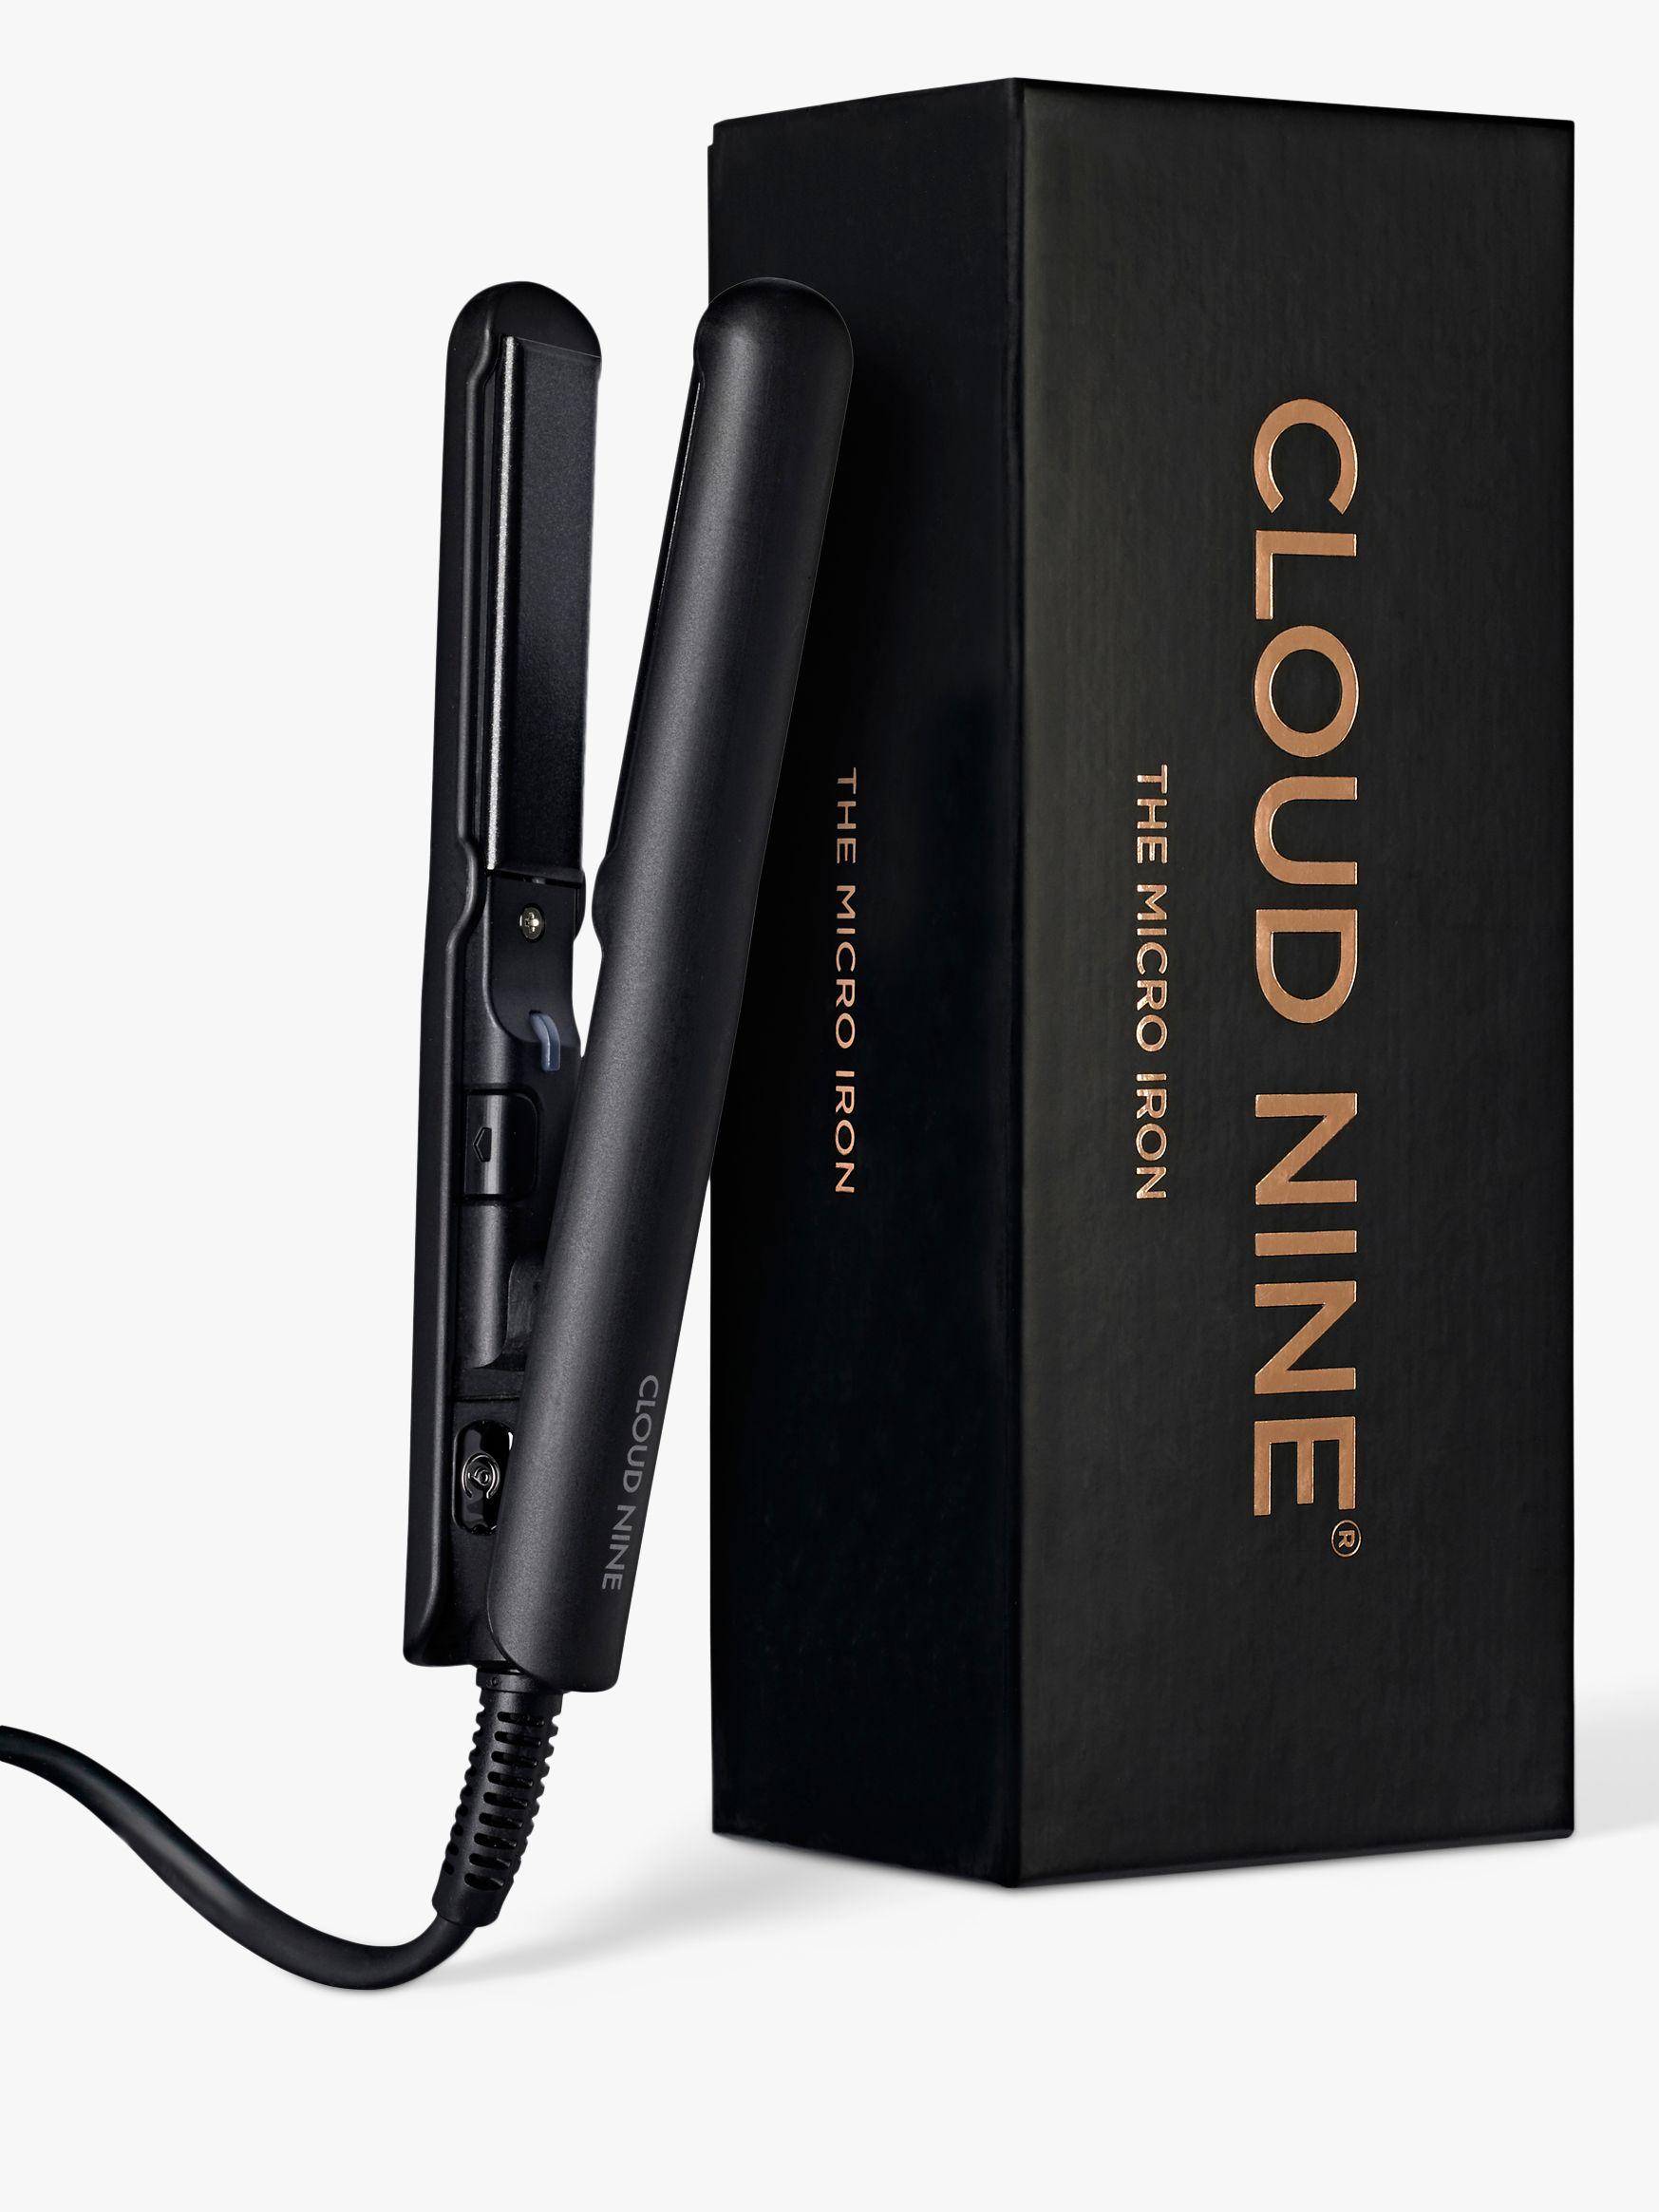 Cloud Nine Cloud Nine Micro Iron Hair Styler